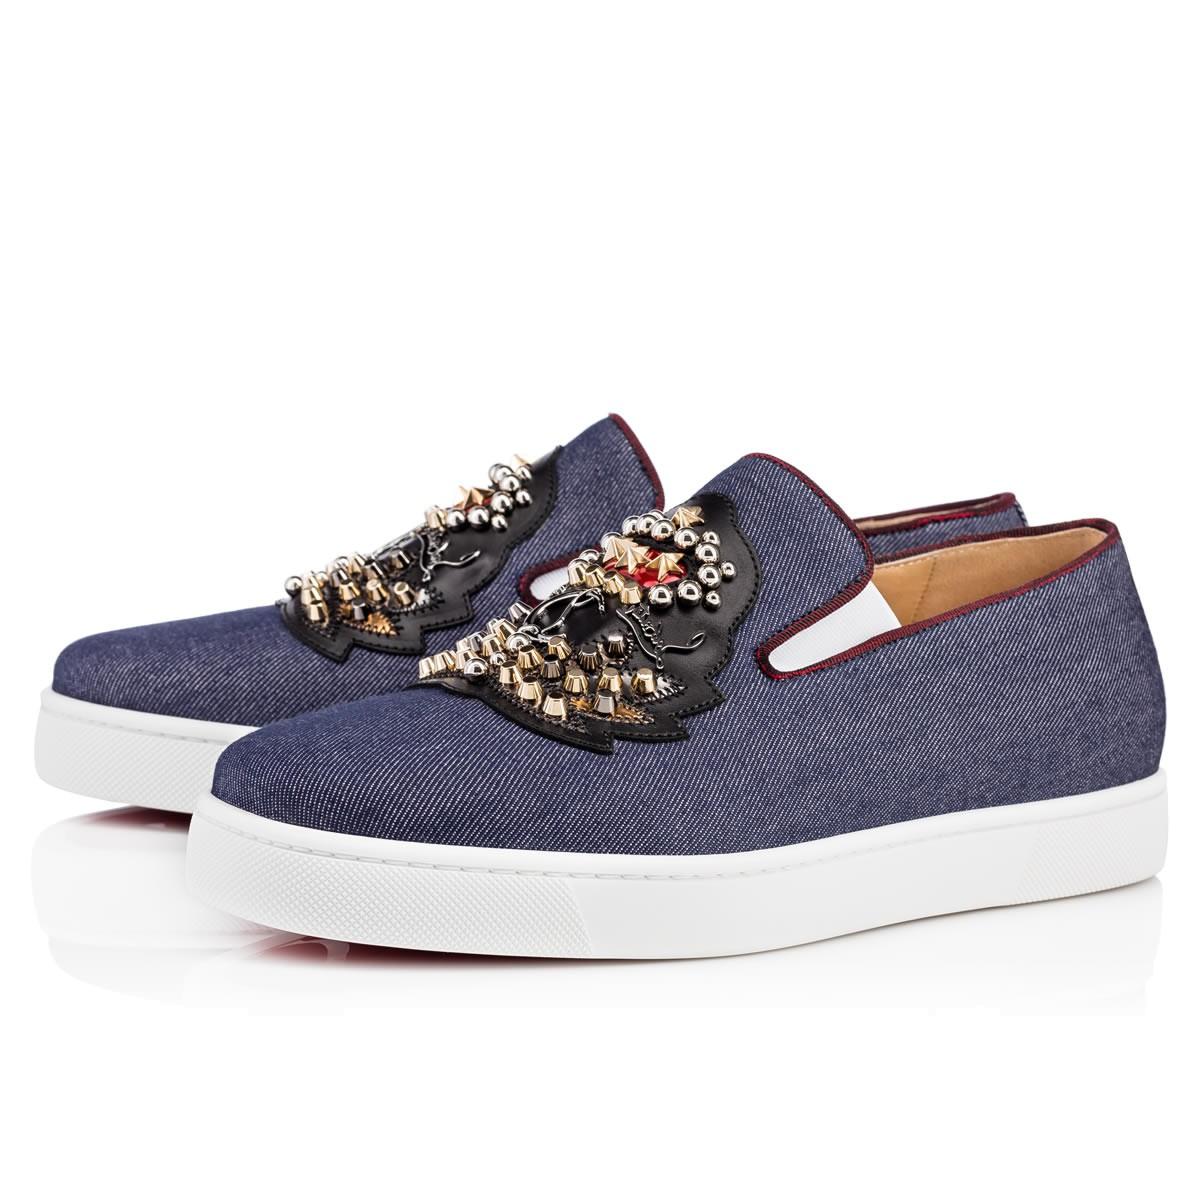 CHRISTIAN LOUBOUTIN Ecuboat Flat  Blue Denim - Men Shoes - Christian Louboutin